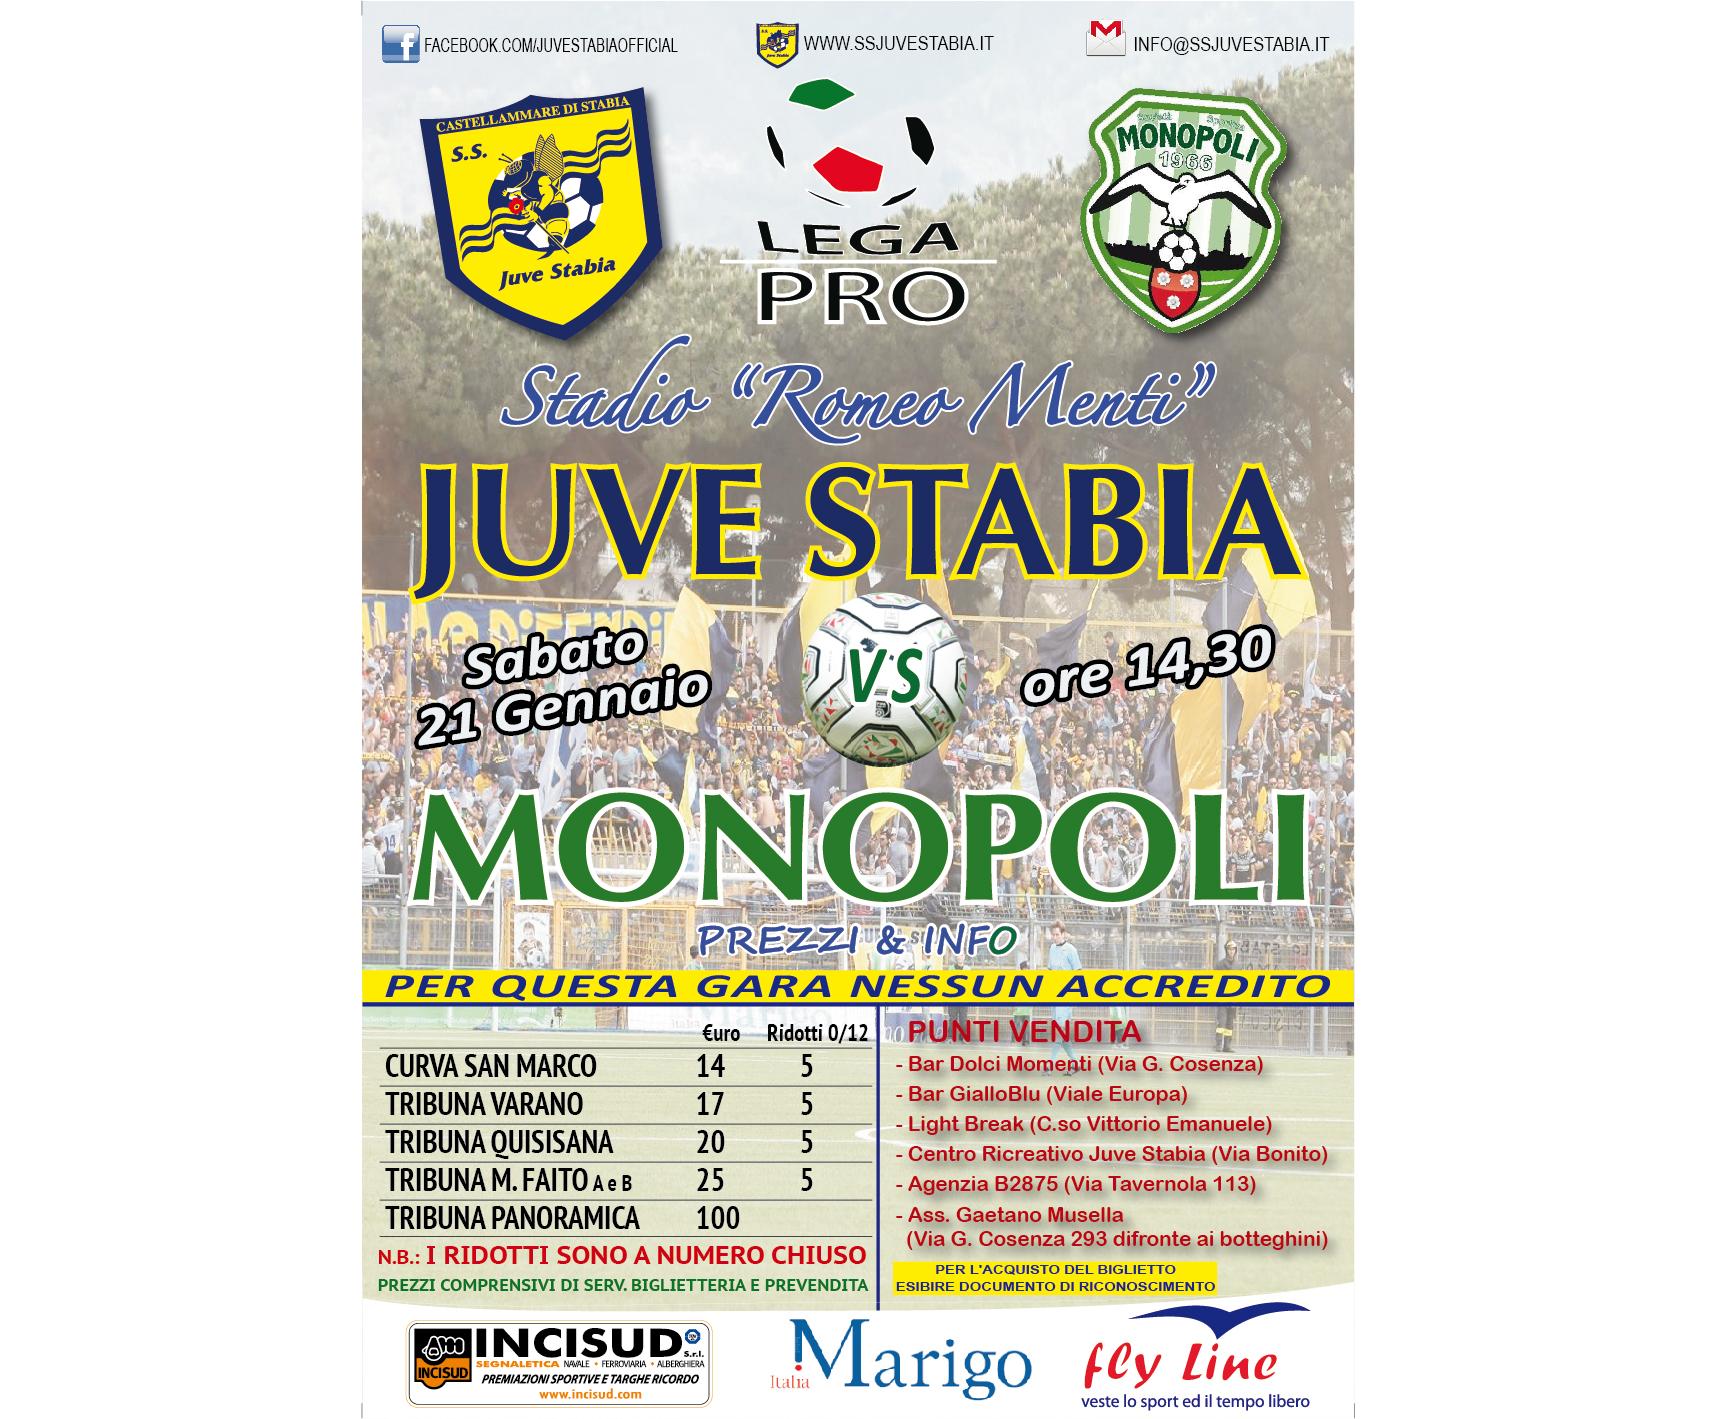 Juve Stabia-Monopoli prevendita